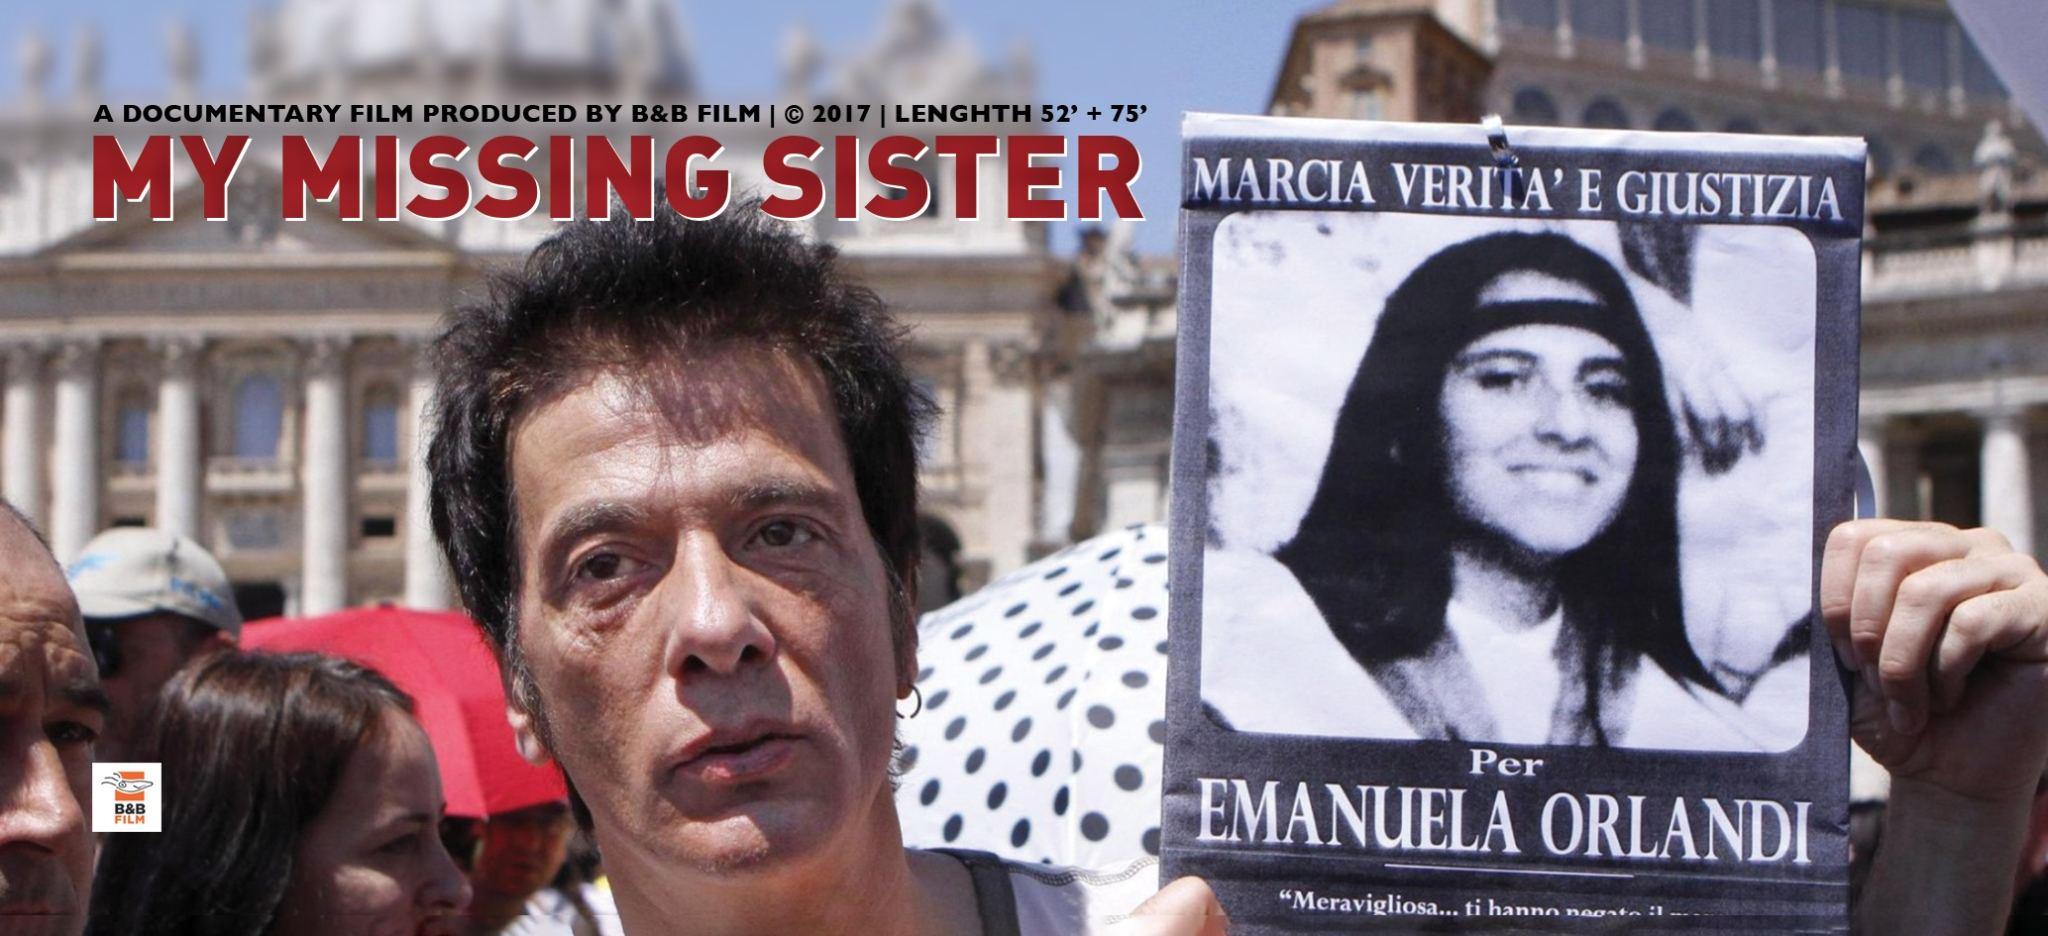 Emanuela Orlandi, trent'anni dopo. My Missing Sister (B&B Film, Film Production) di Alessandra Bruno, progetto del MIA|DOC Pitching Forum